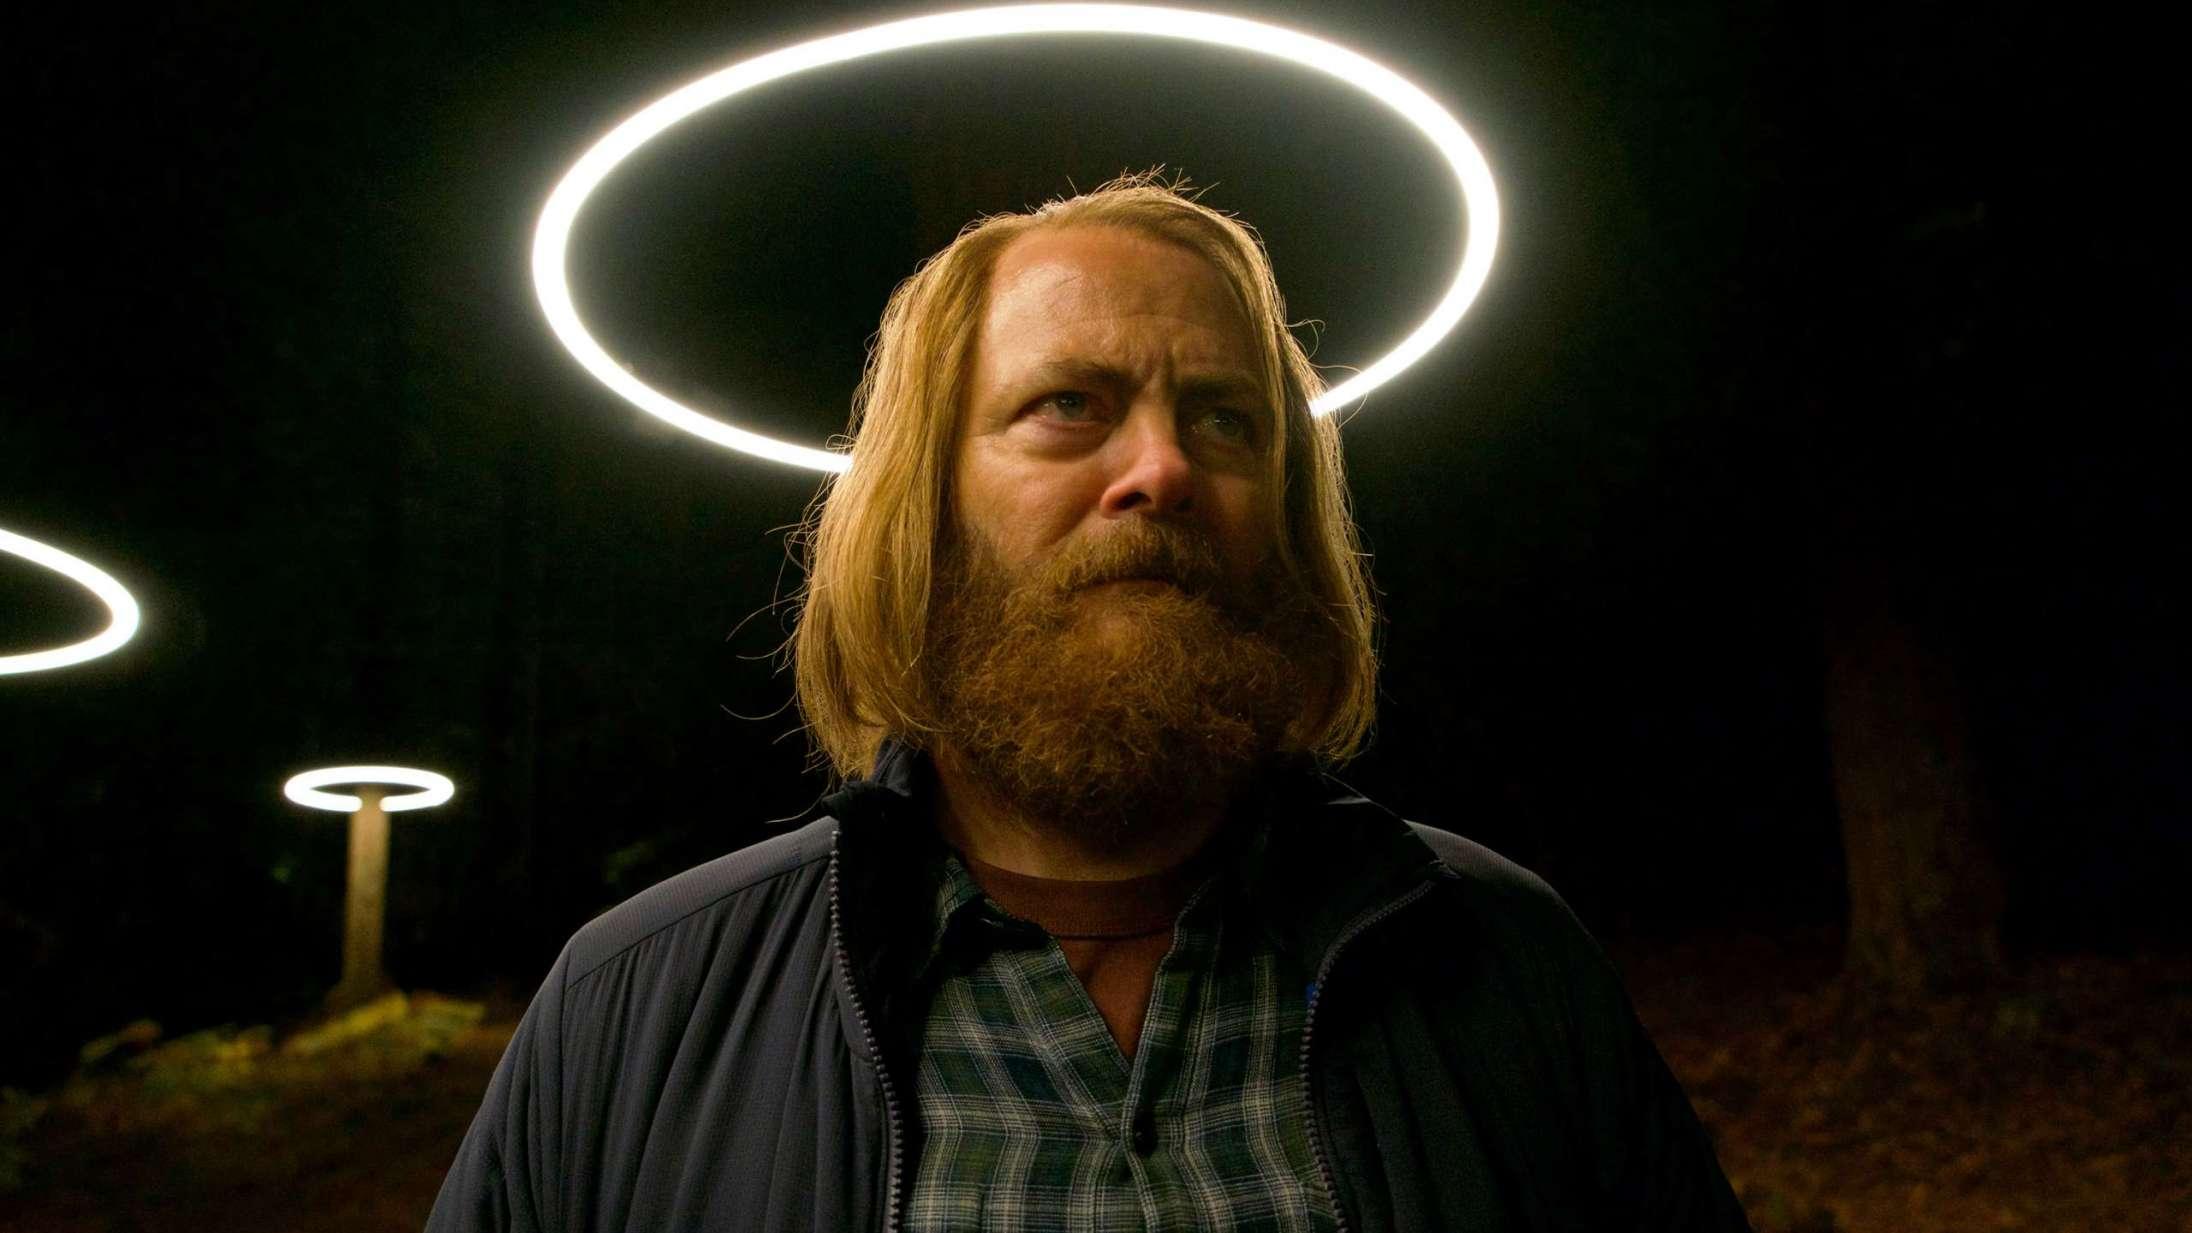 Se listen over de 10 mest sete serier på HBO Nordic i 2020